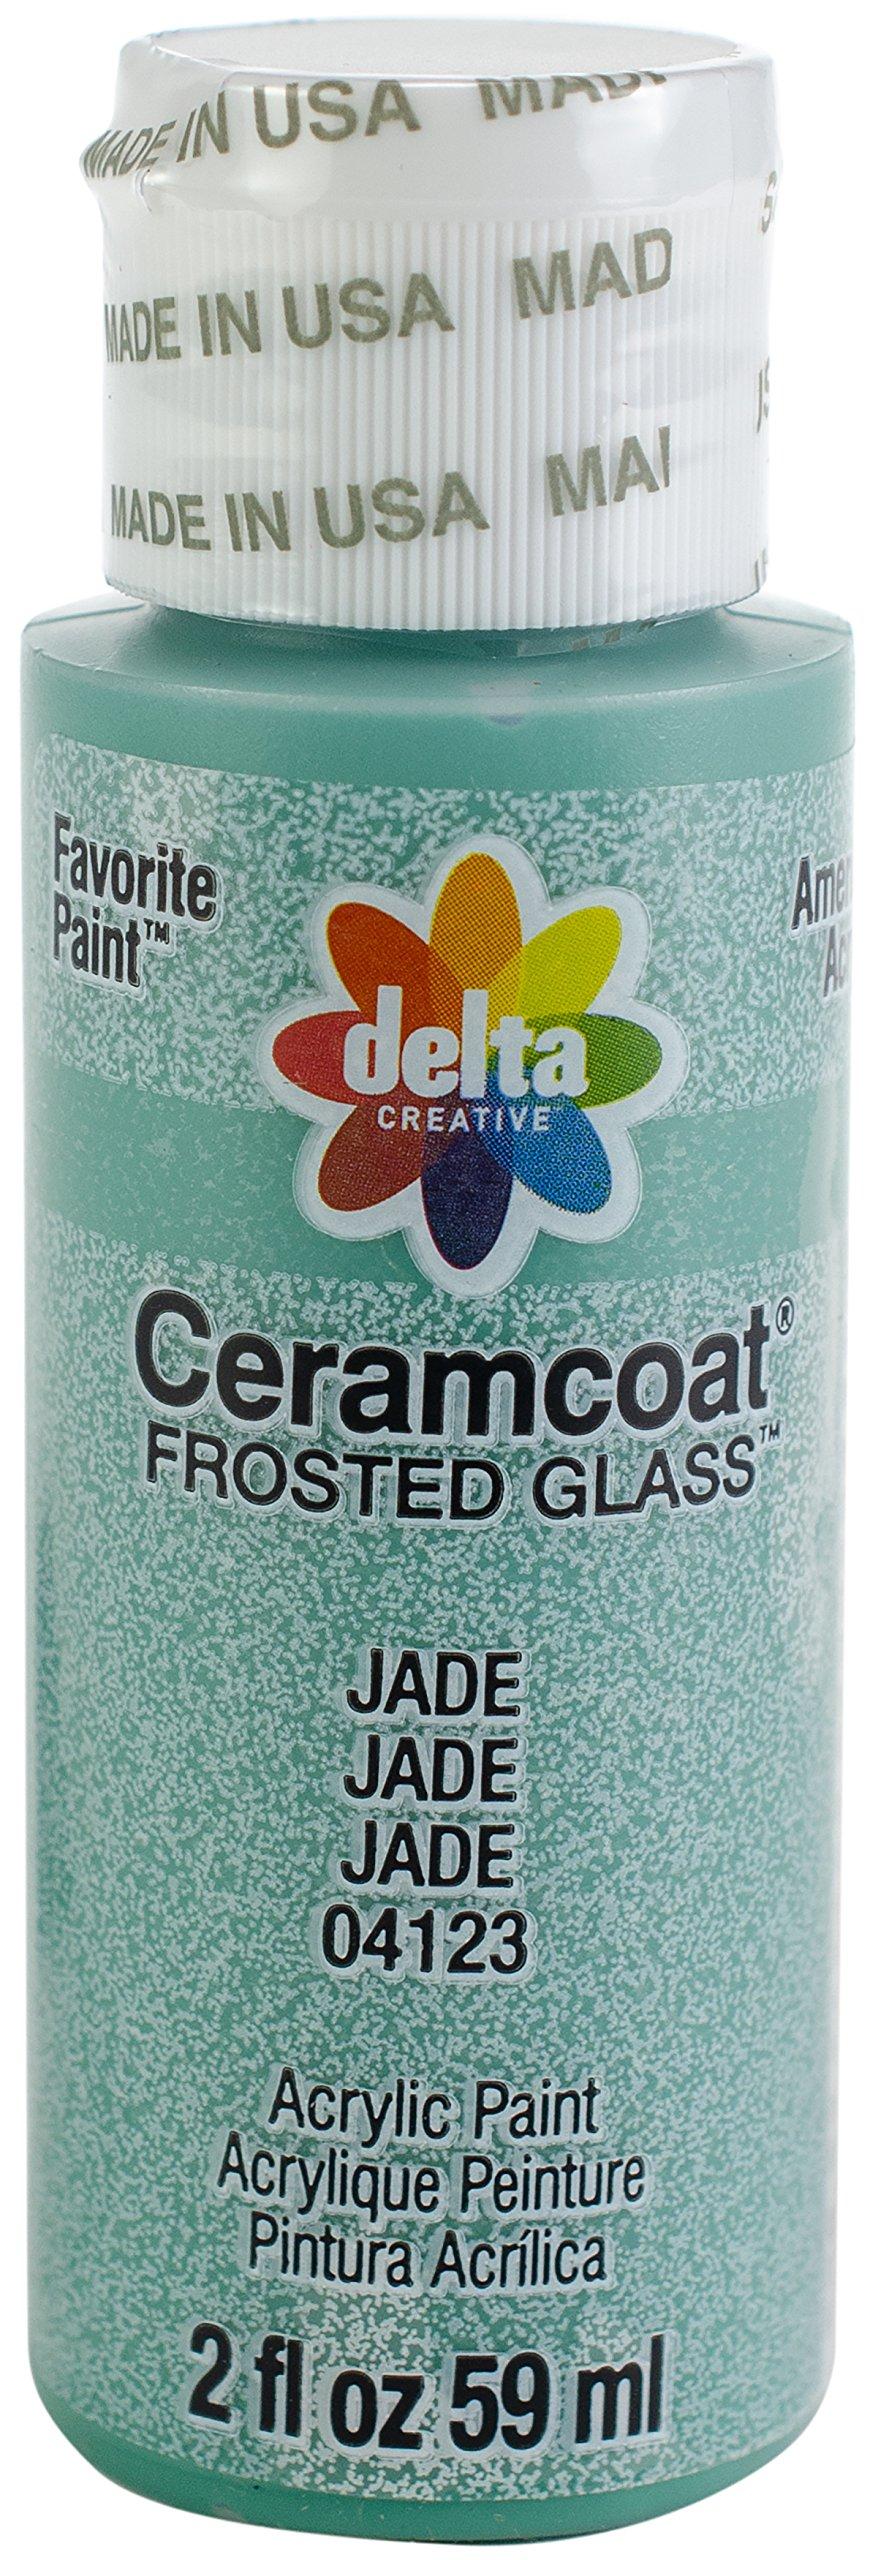 Delta Creative 4123 Ceram Coat Frost Acrylic Paint, 2 oz, Jade